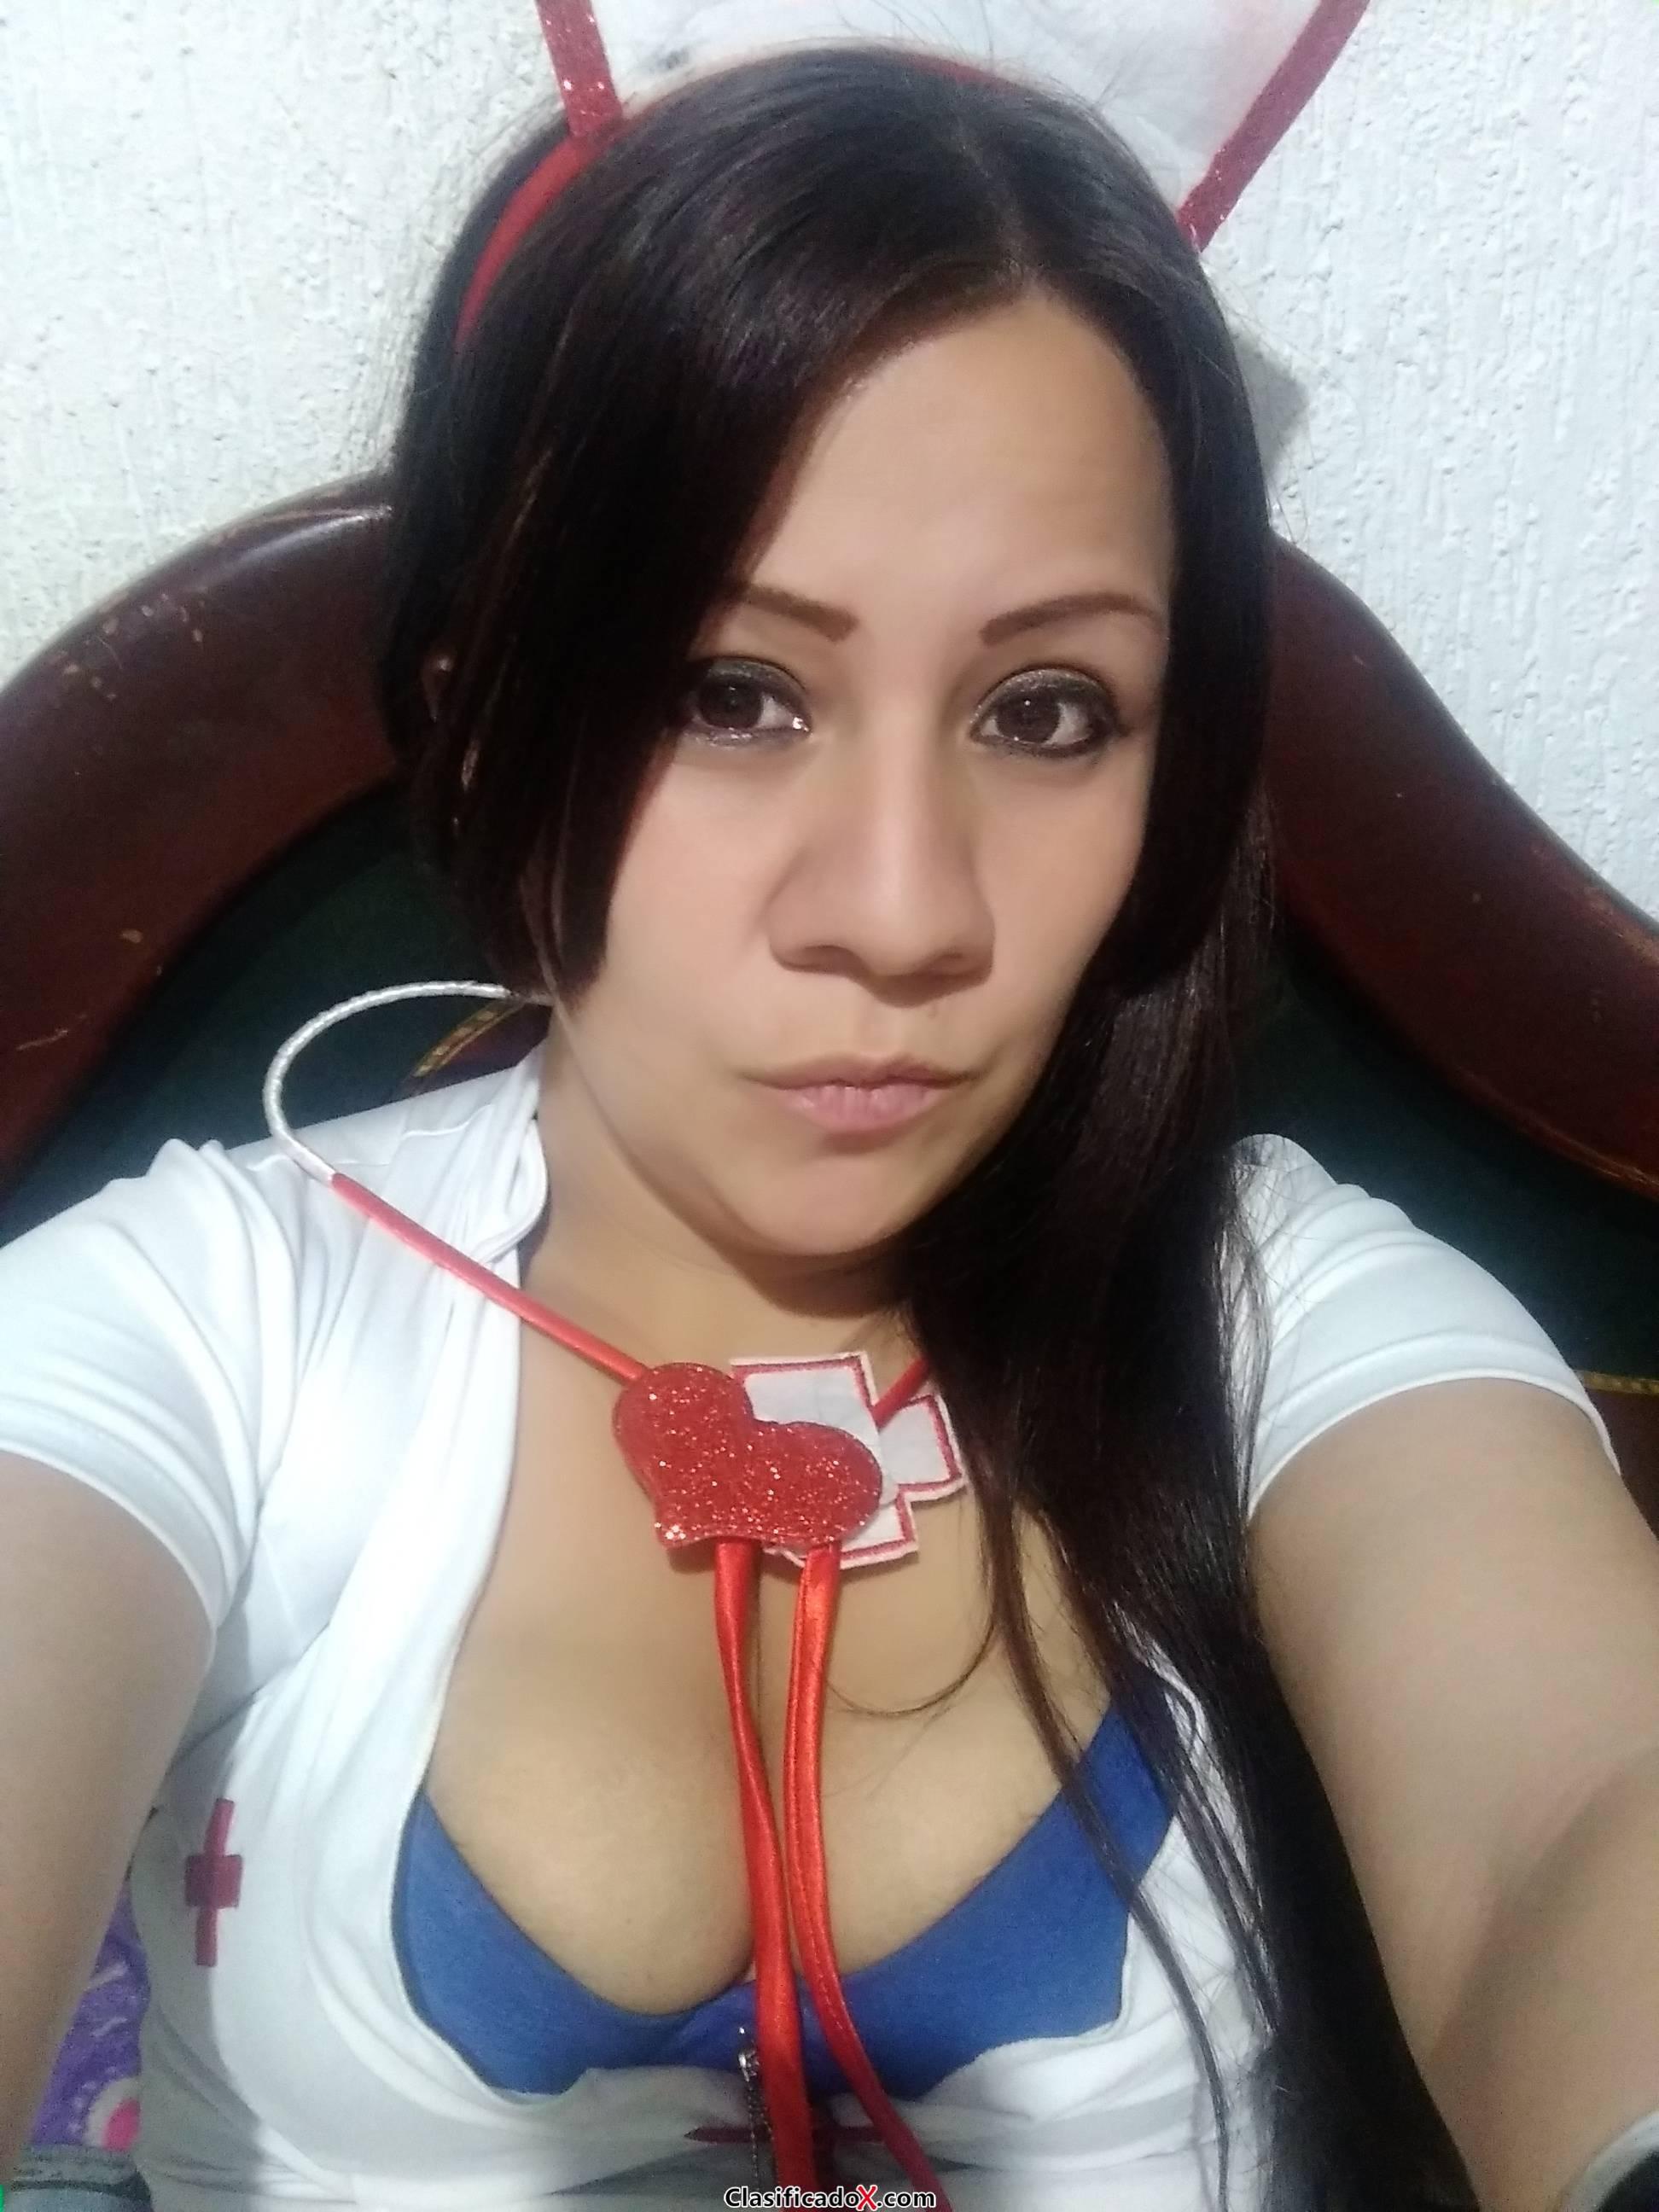 +573185293459 natalia colombia